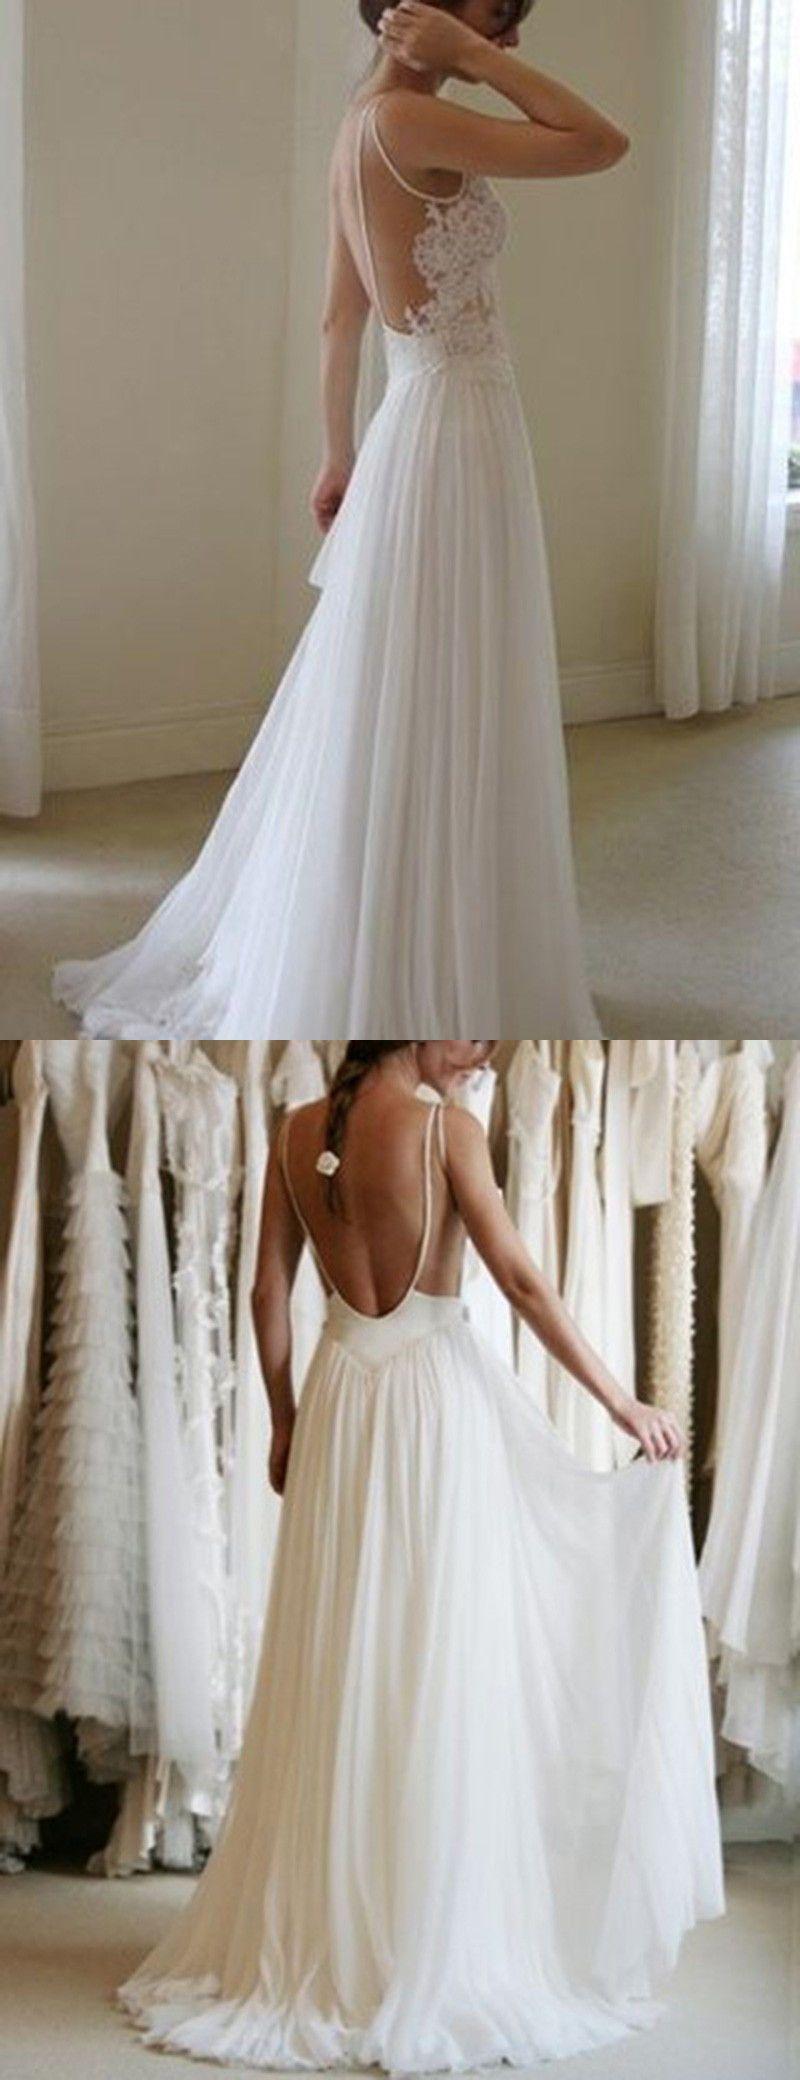 wedding dresses, wedding ideas, open back wedding dress, backless ...